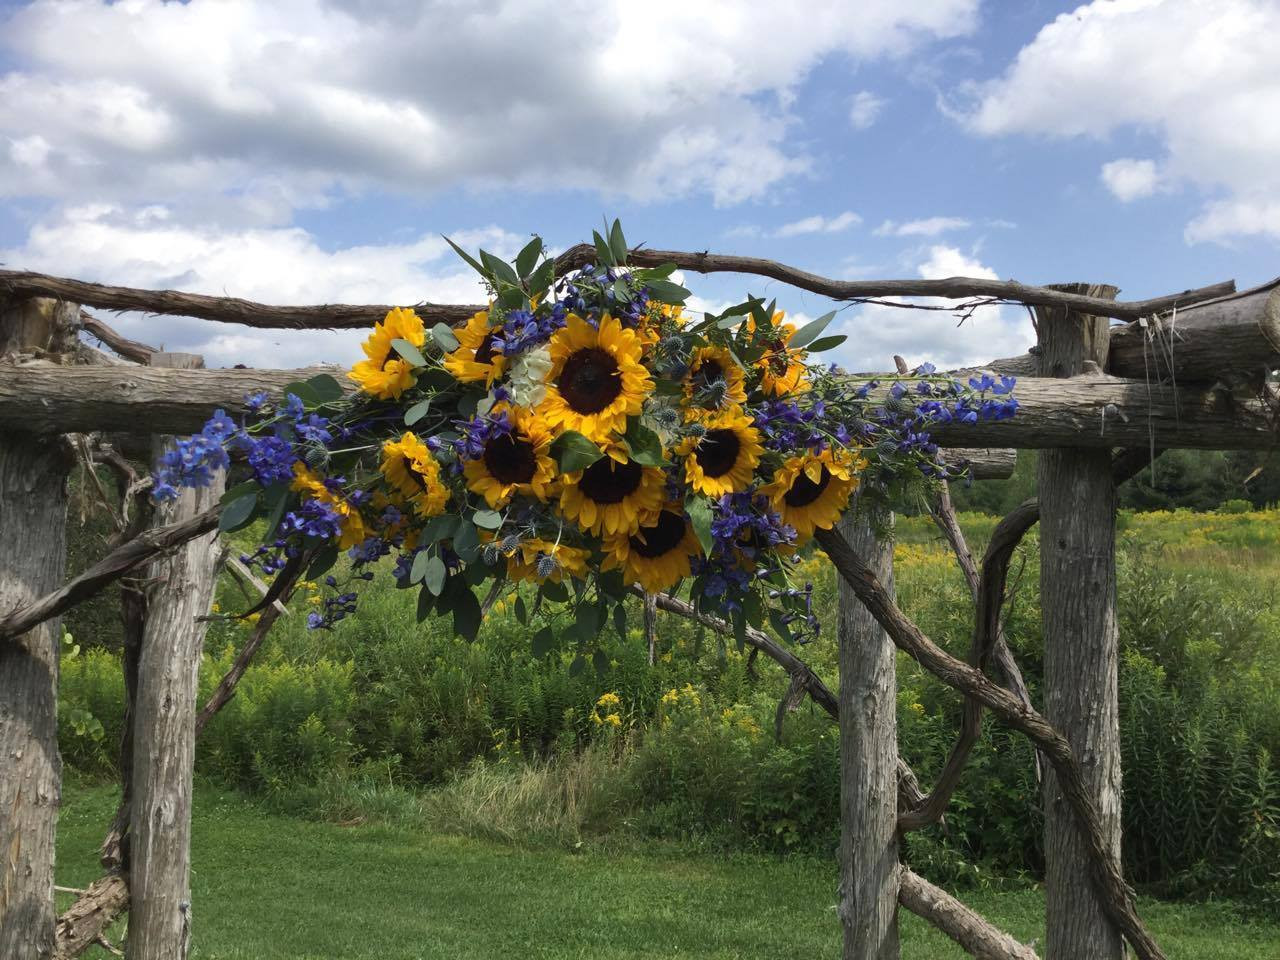 Chappell S Florist Wedding Pieces